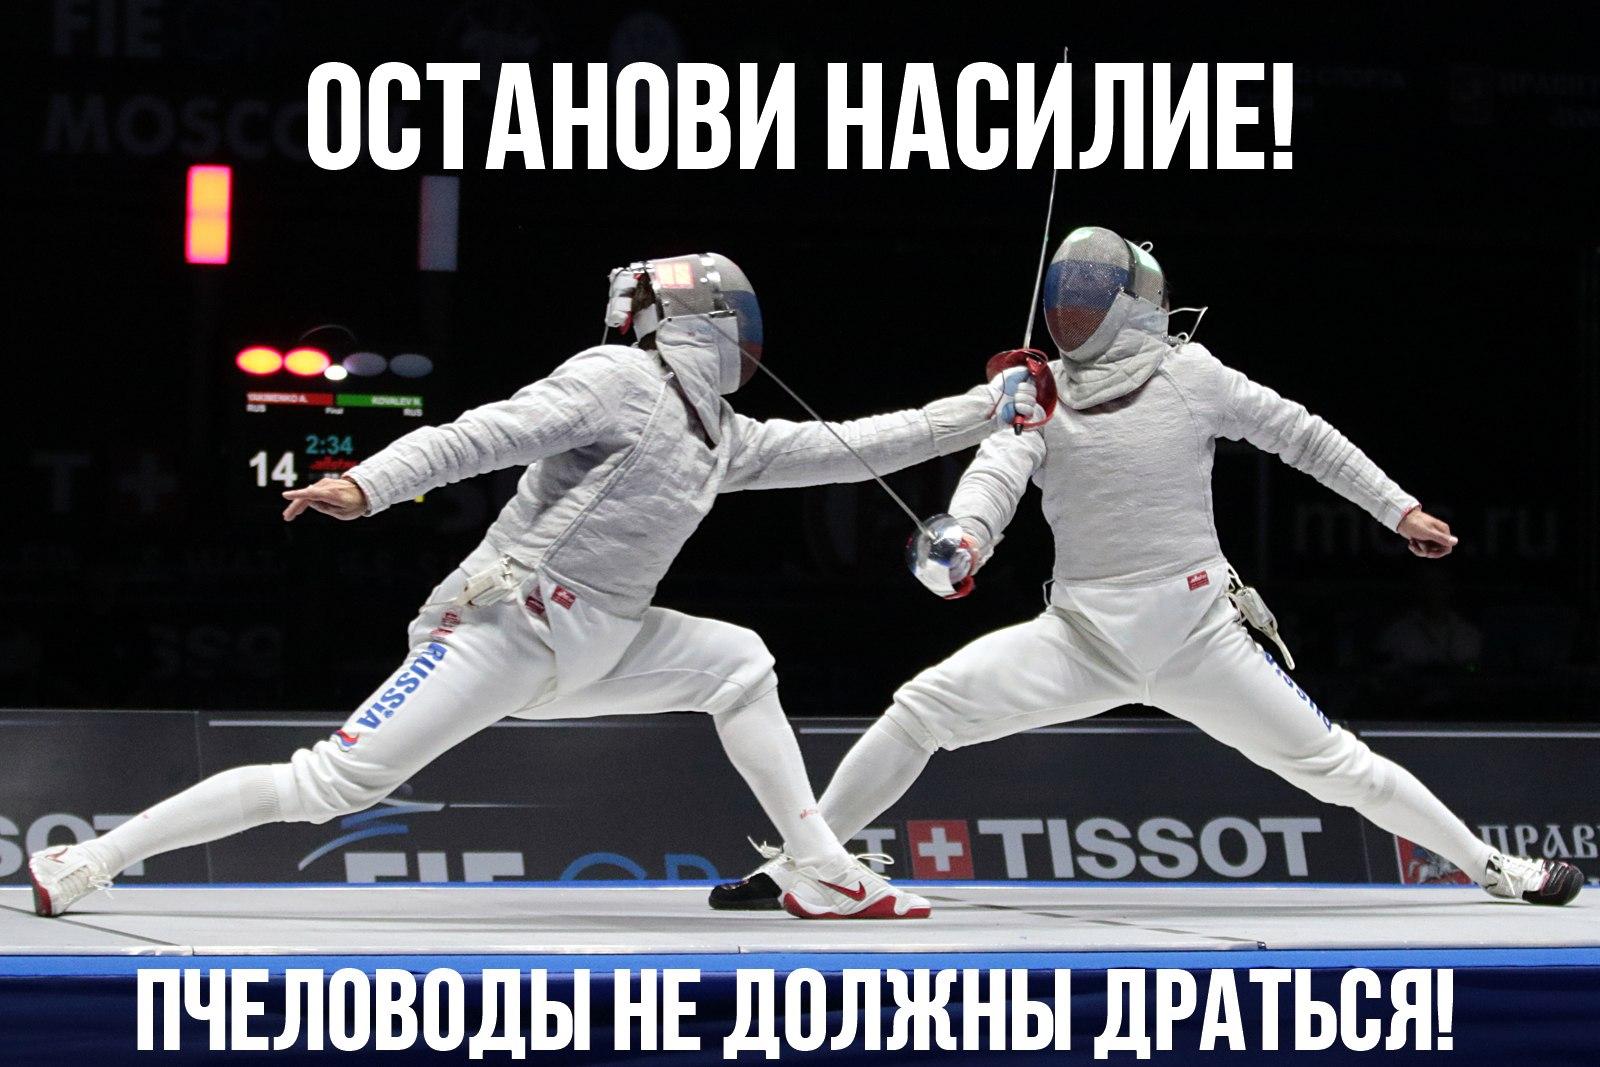 http://s7.uploads.ru/G3ona.jpg